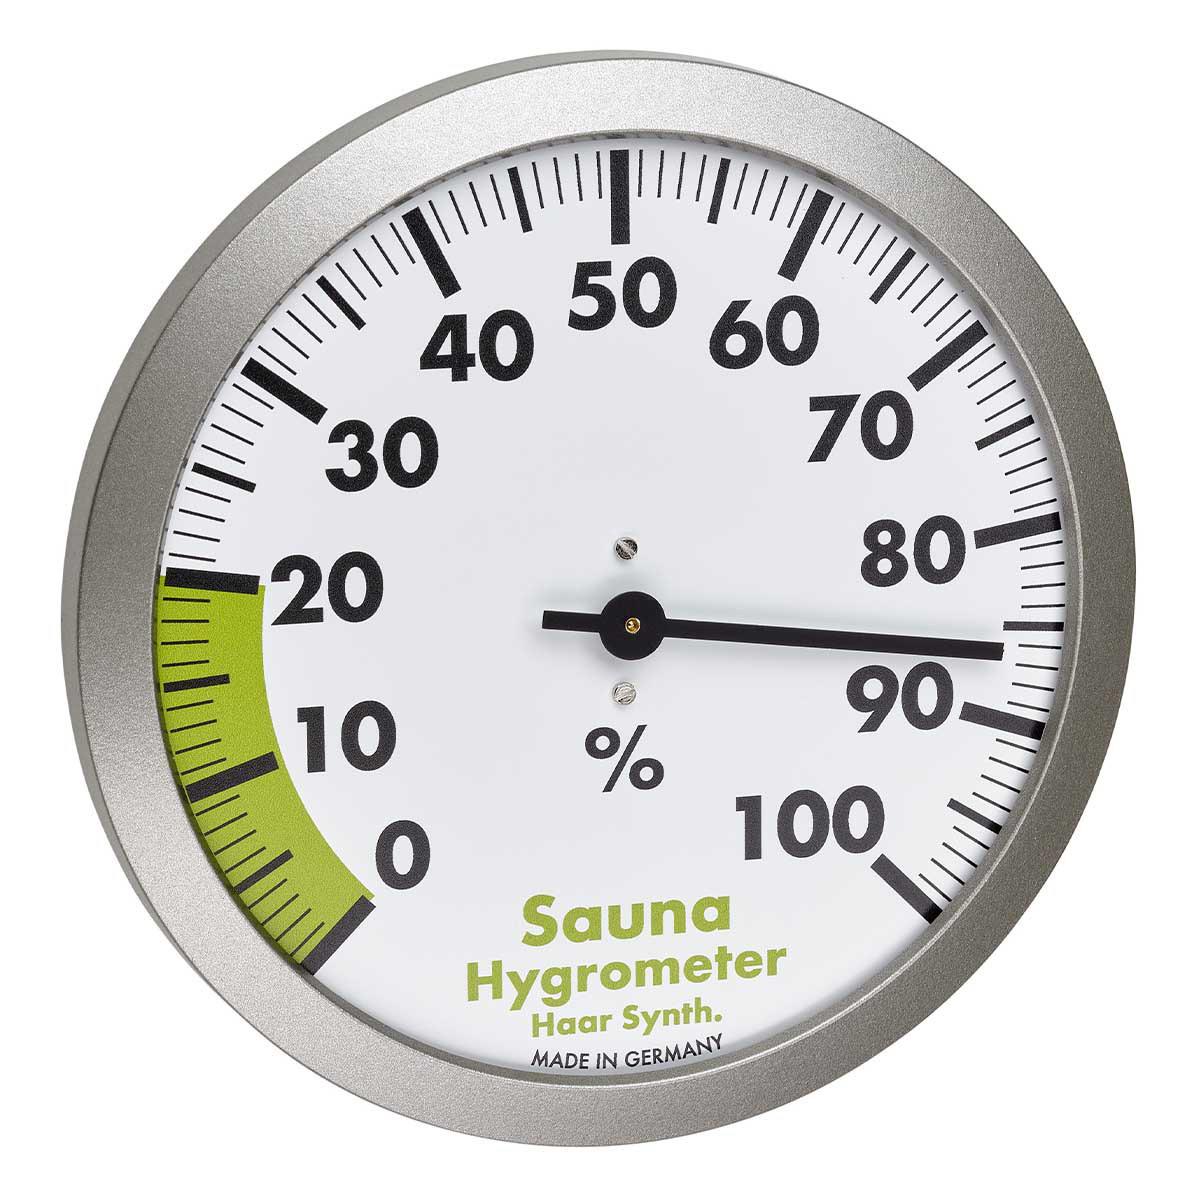 40-1054-50-analoges-sauna-hygrometer-1200x1200px.jpg